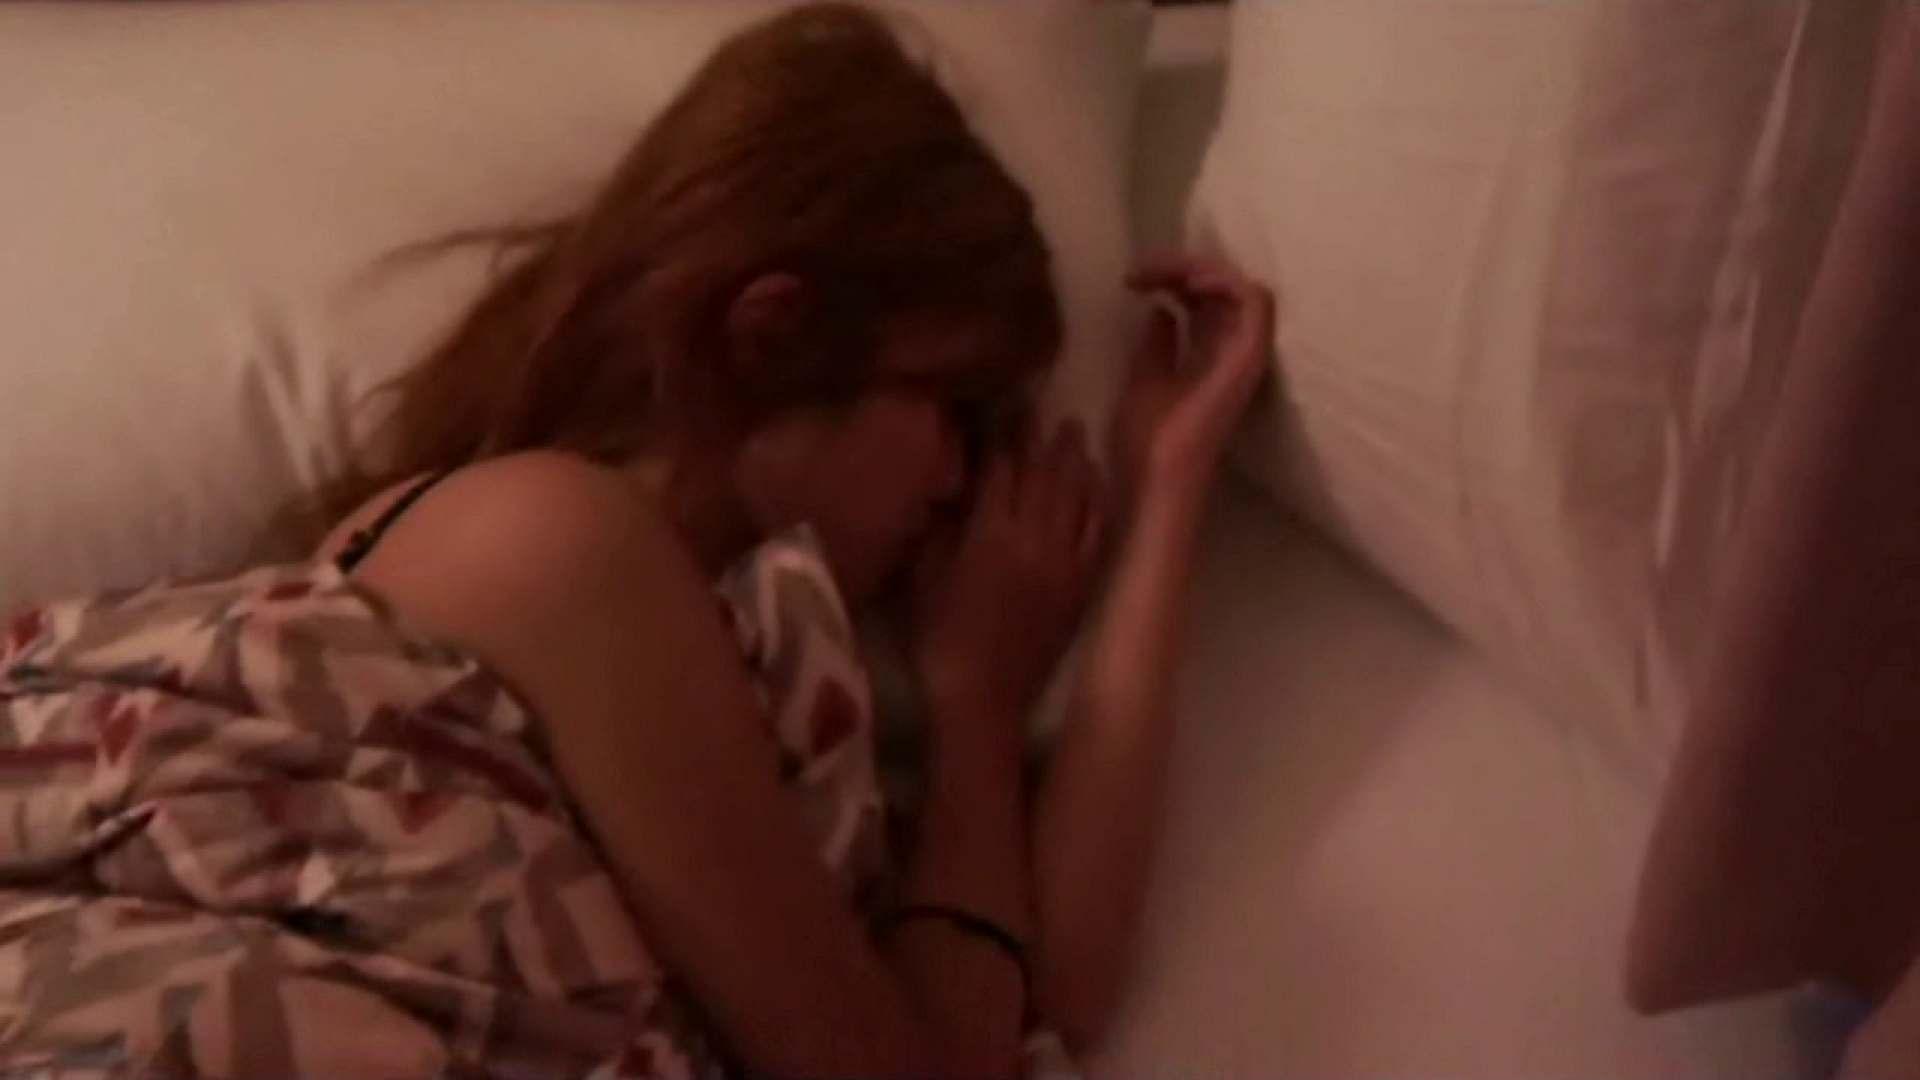 vol.2 【Yちゃん】当時女子大生 帰省した夏の夜 胸チラ  90PIX 50